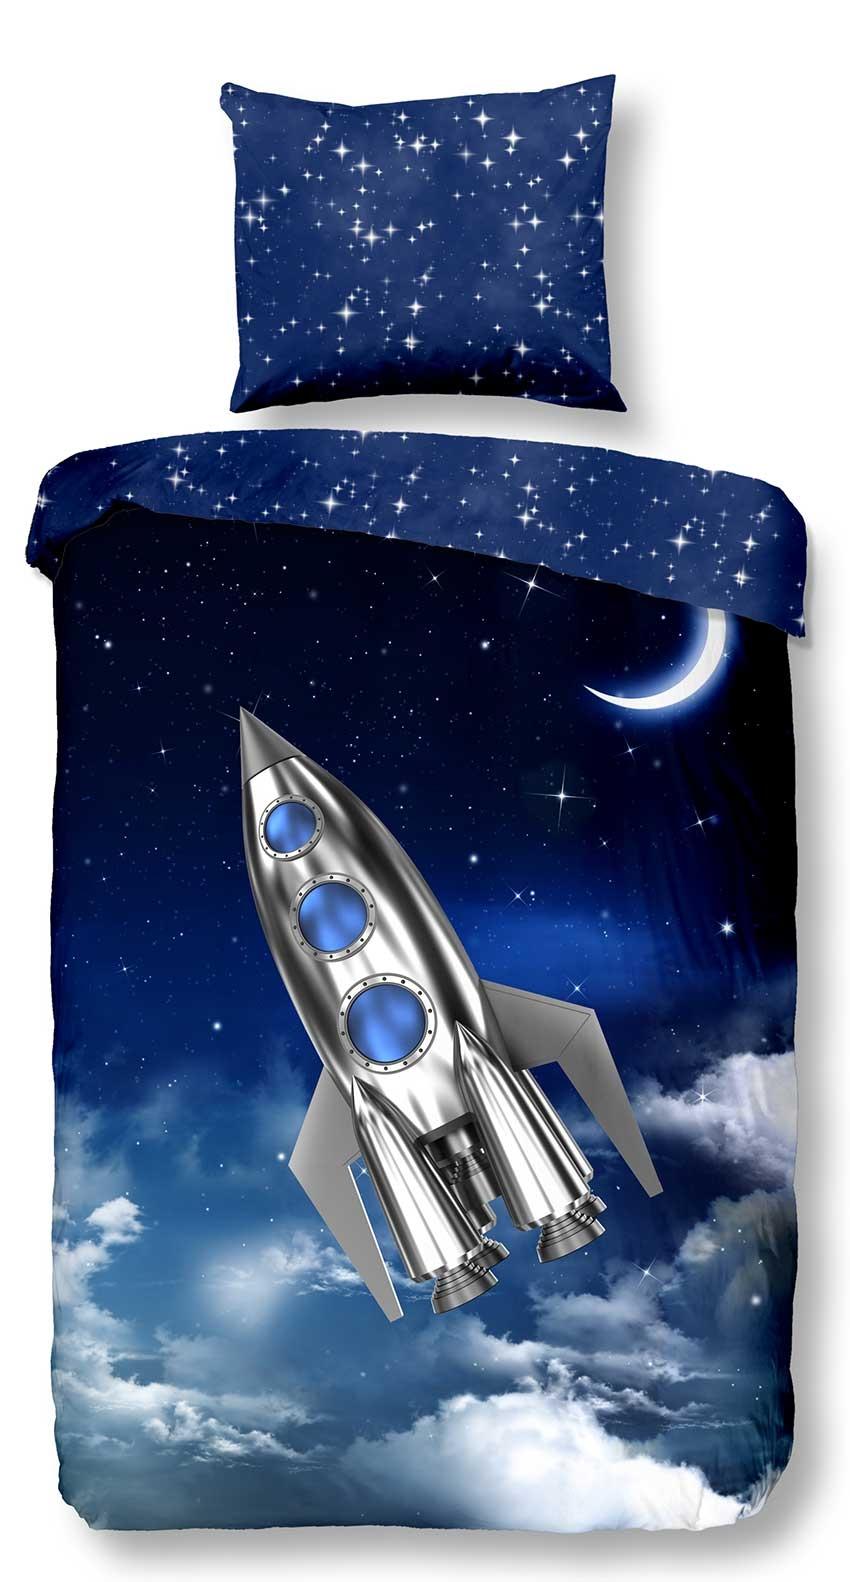 Good Morning Kids Dekbedovertrek Rocket